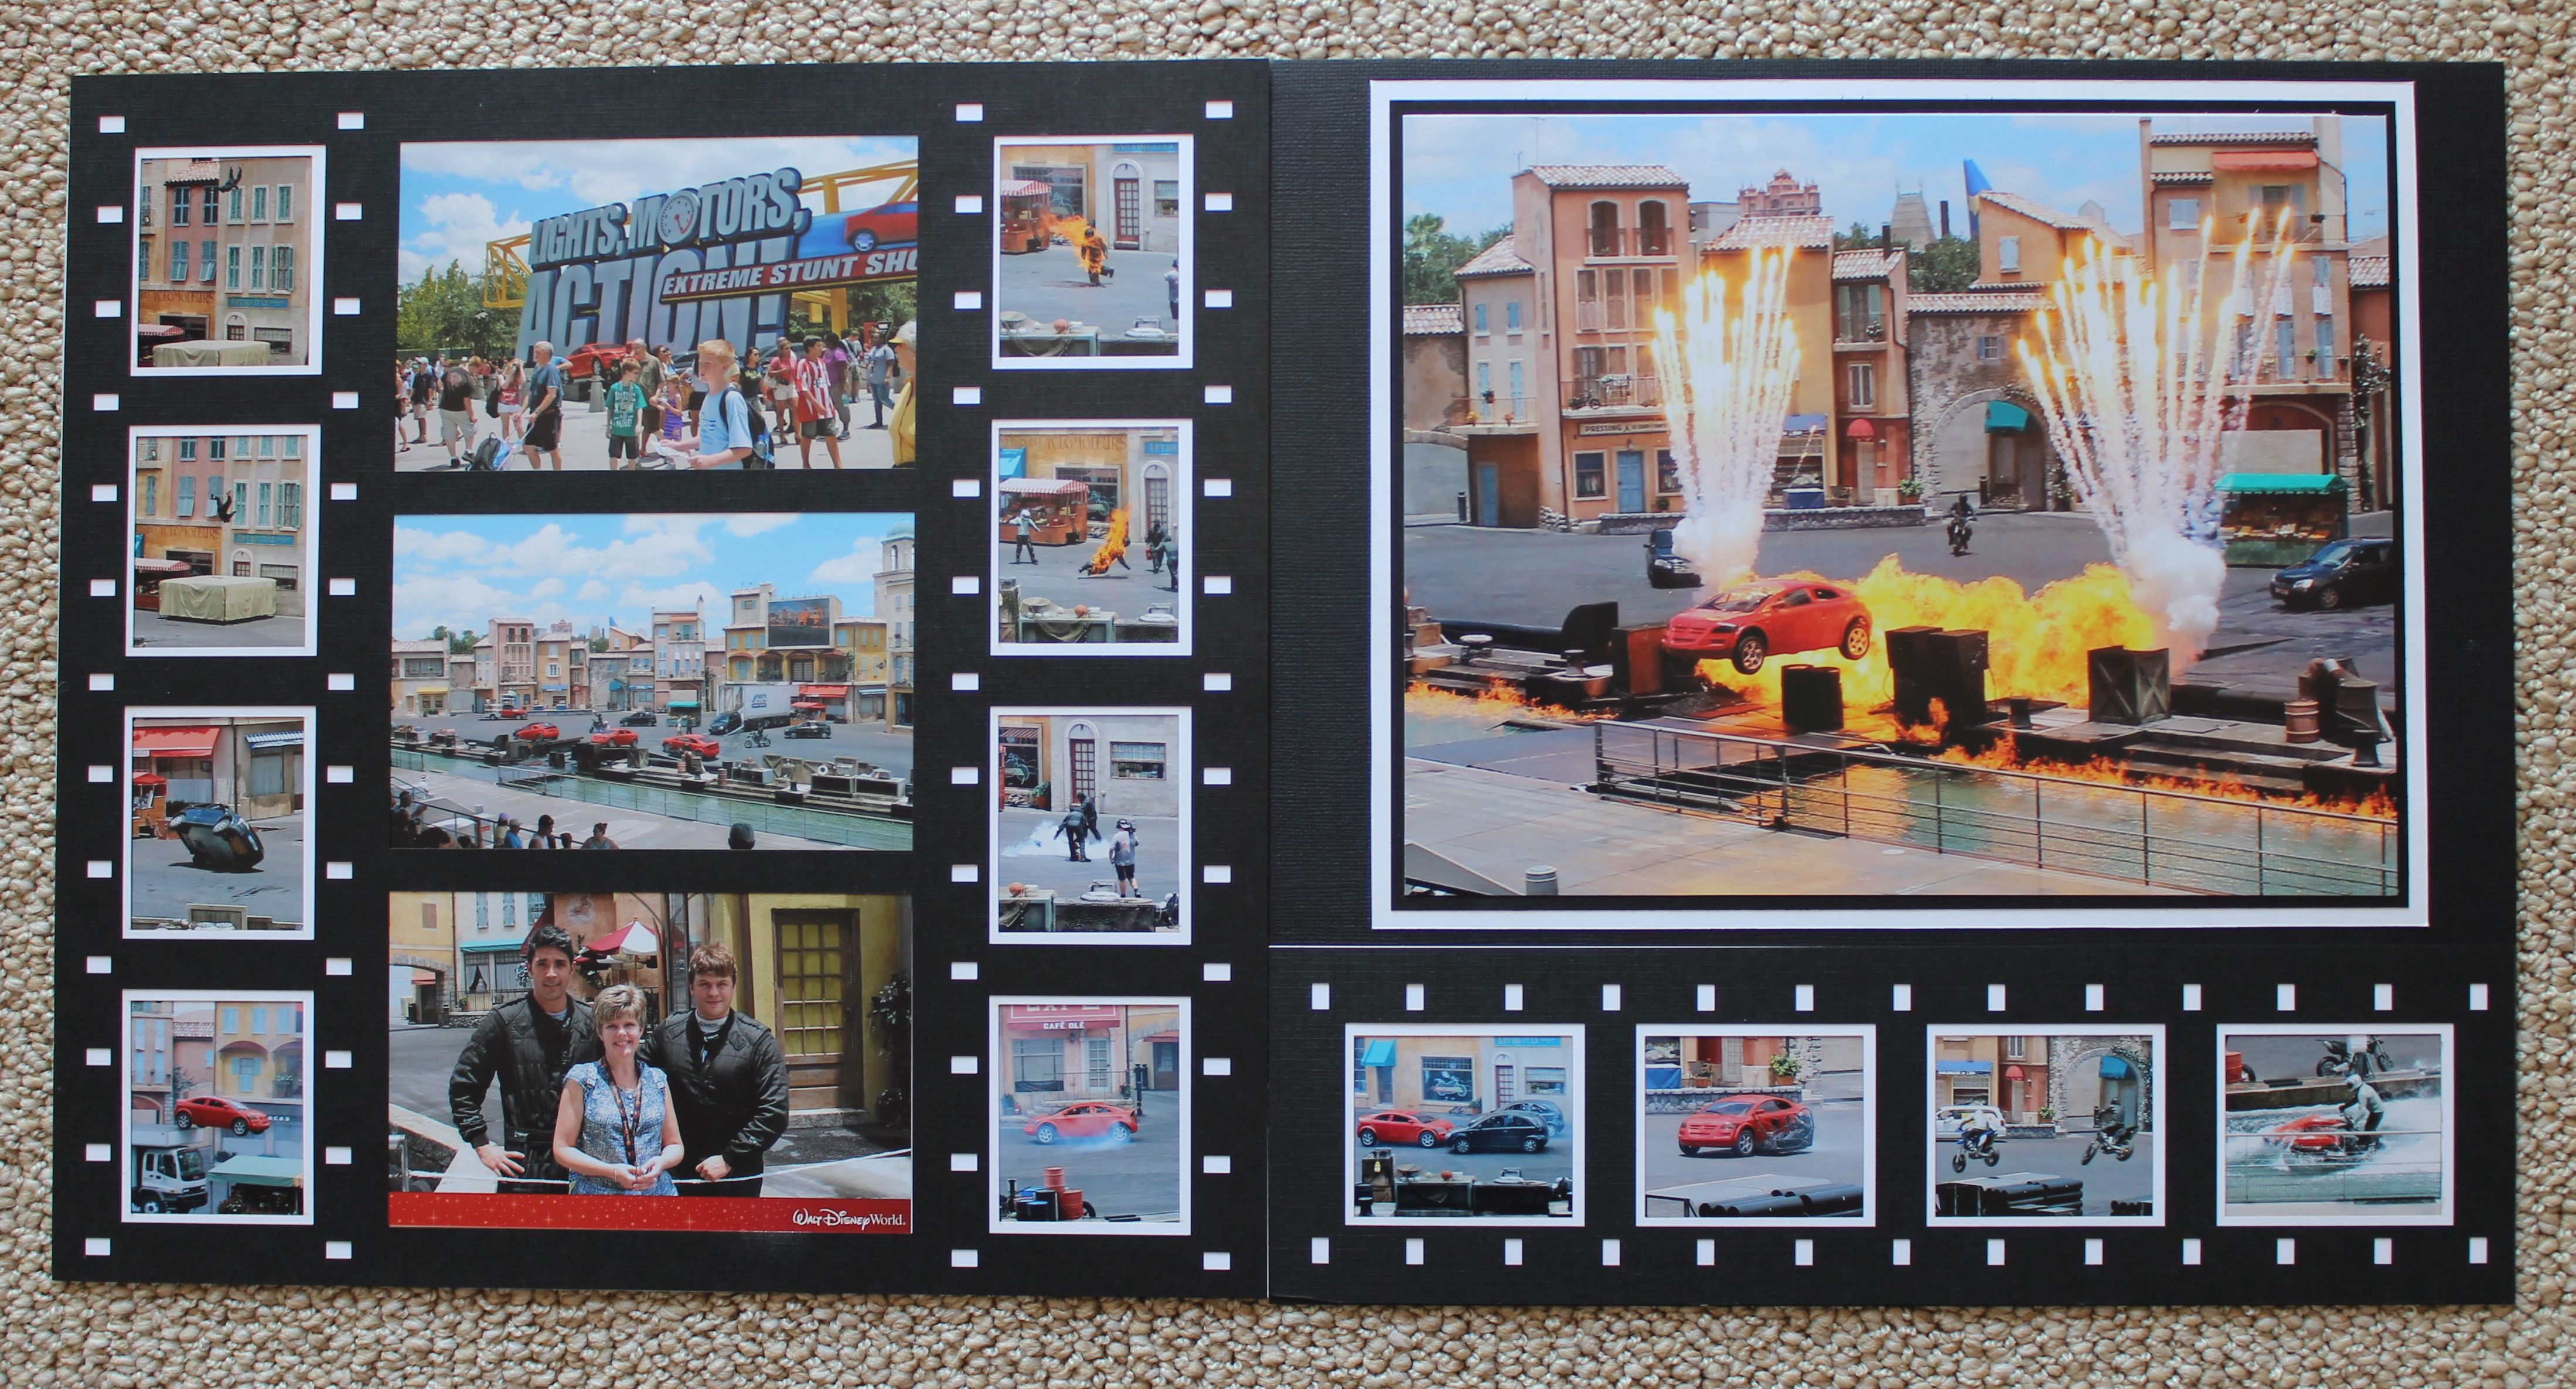 Disneyus lights motor action scrapbook layout scrapbooks